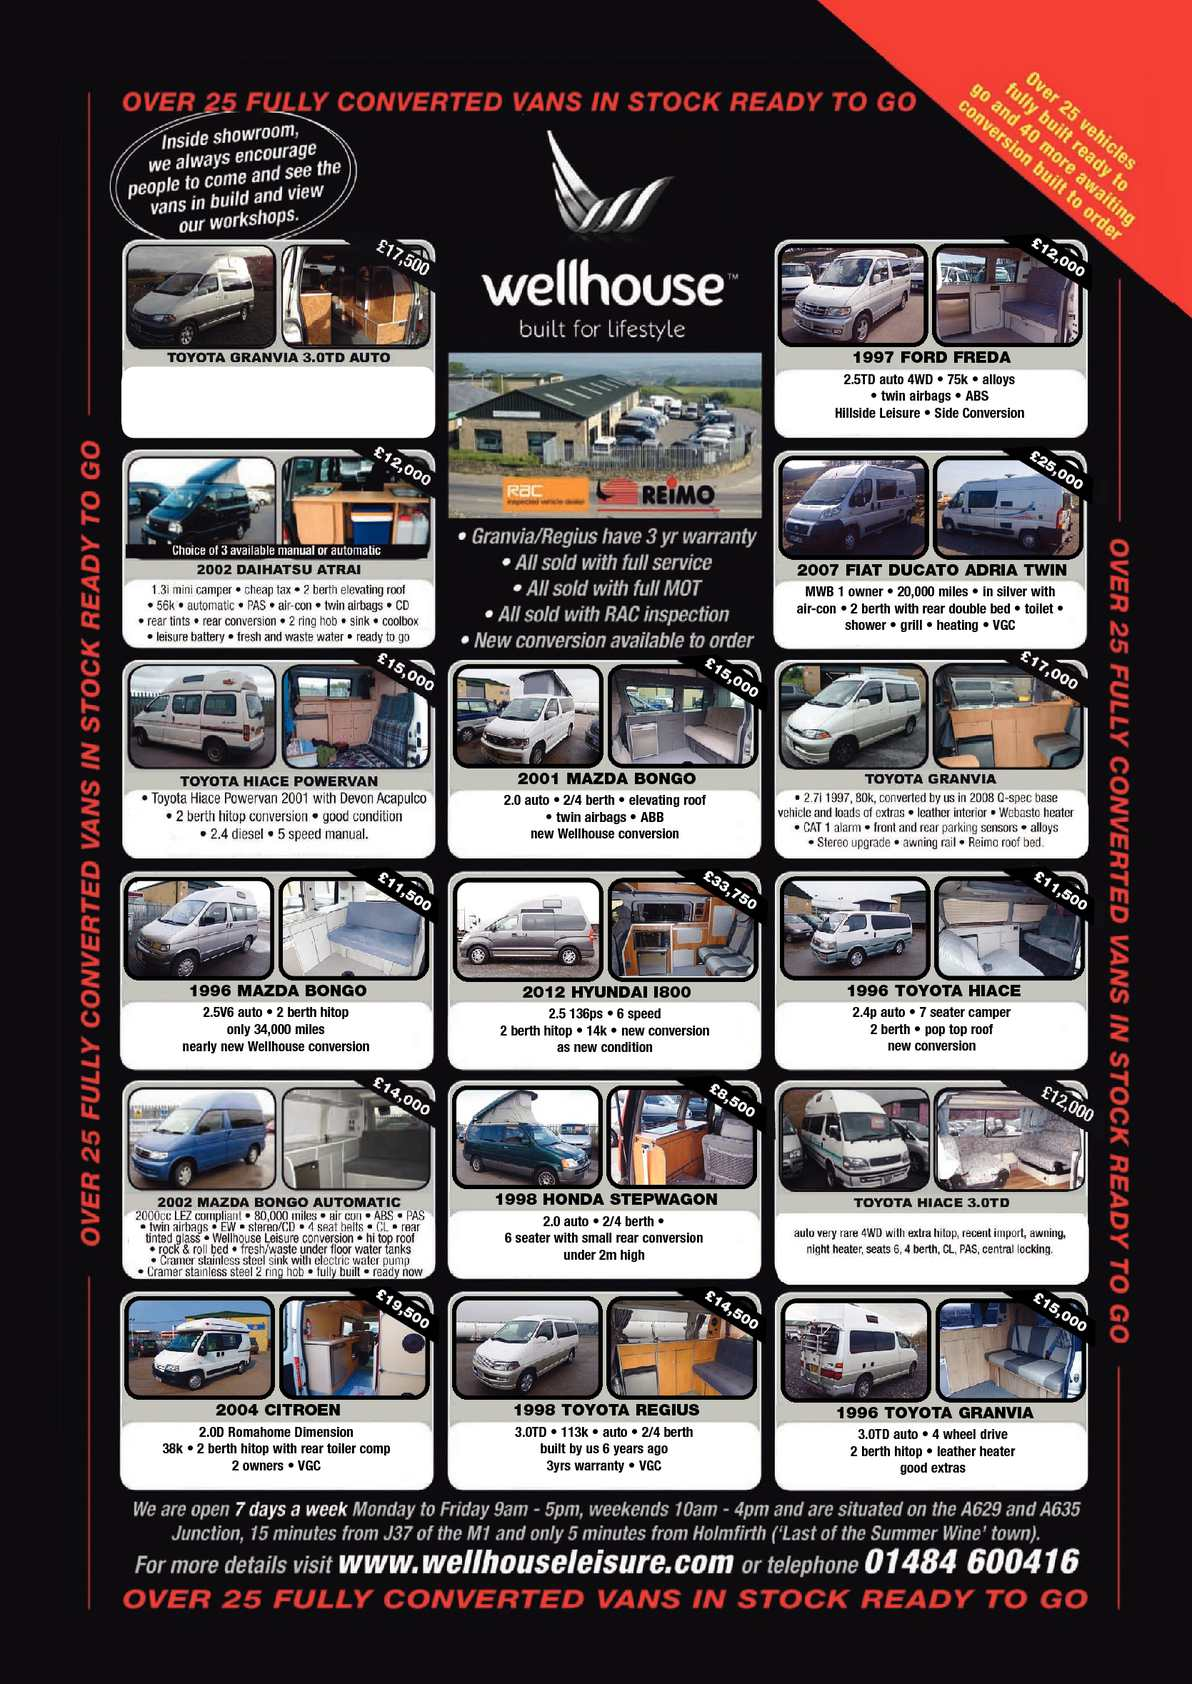 July 2013 Motorhome & Campervan CALAMEO Downloader